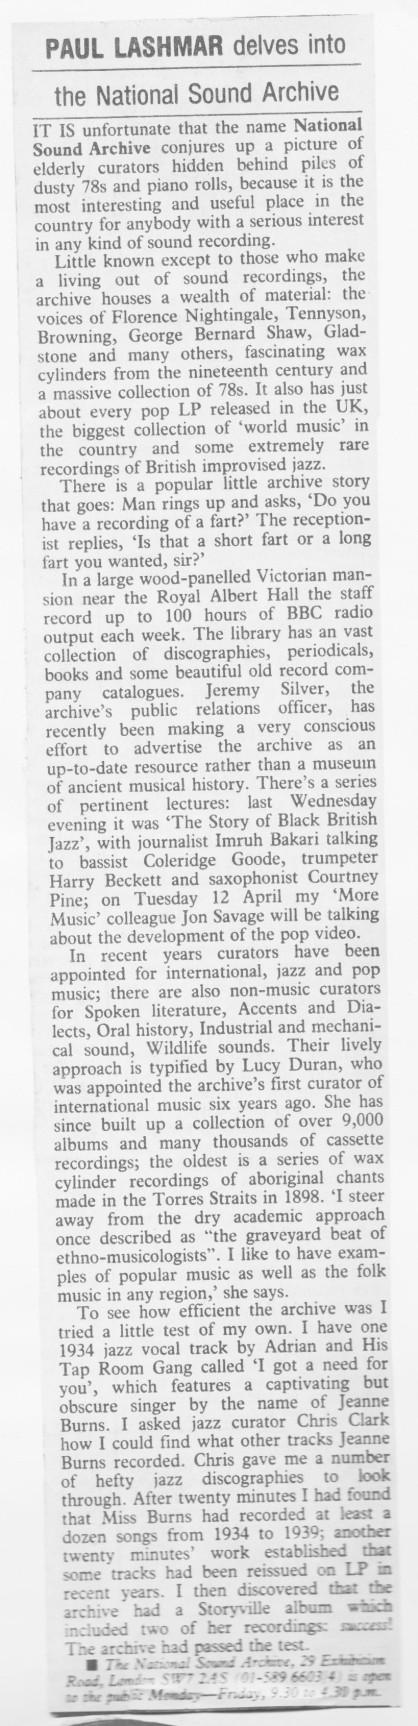 National Sound Archive 4